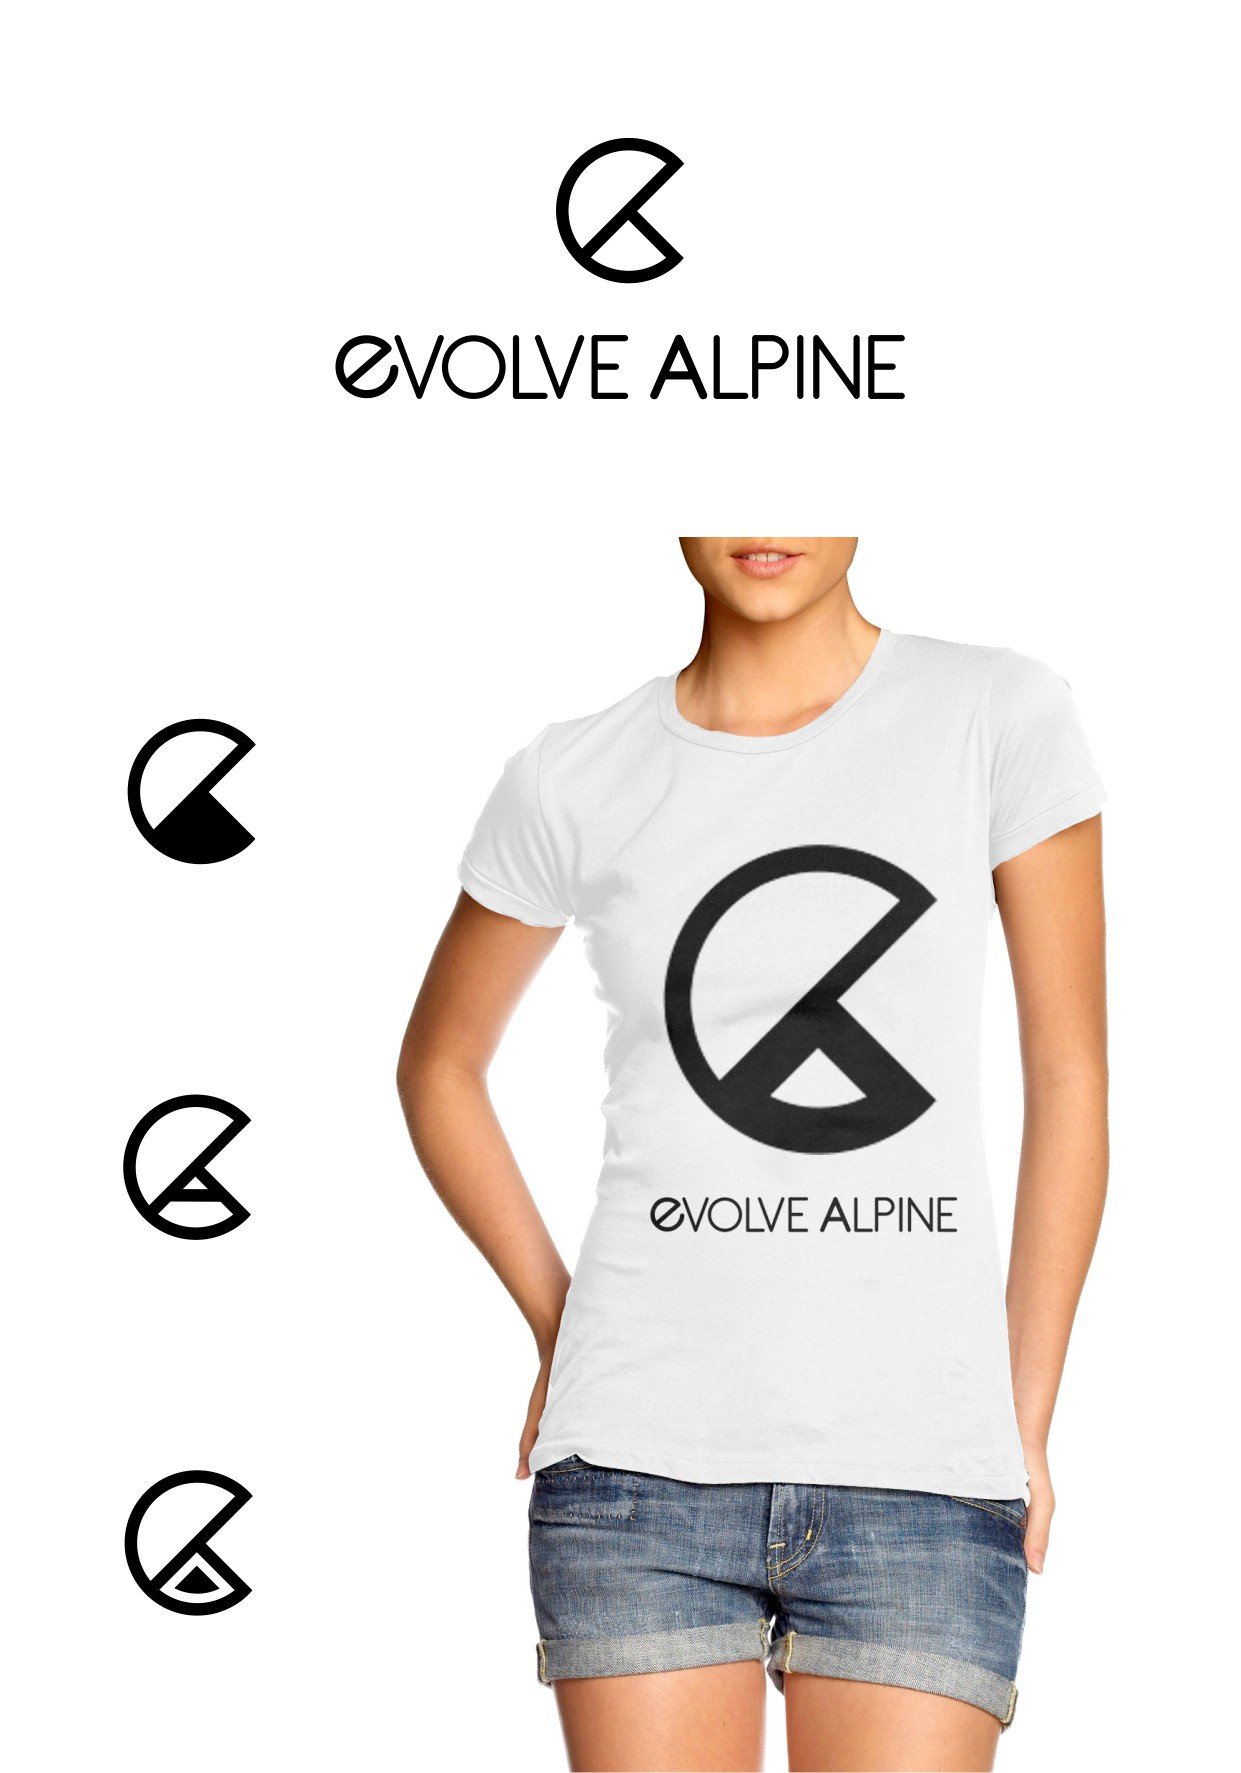 Create the next logo for EVOLVE ALPINE